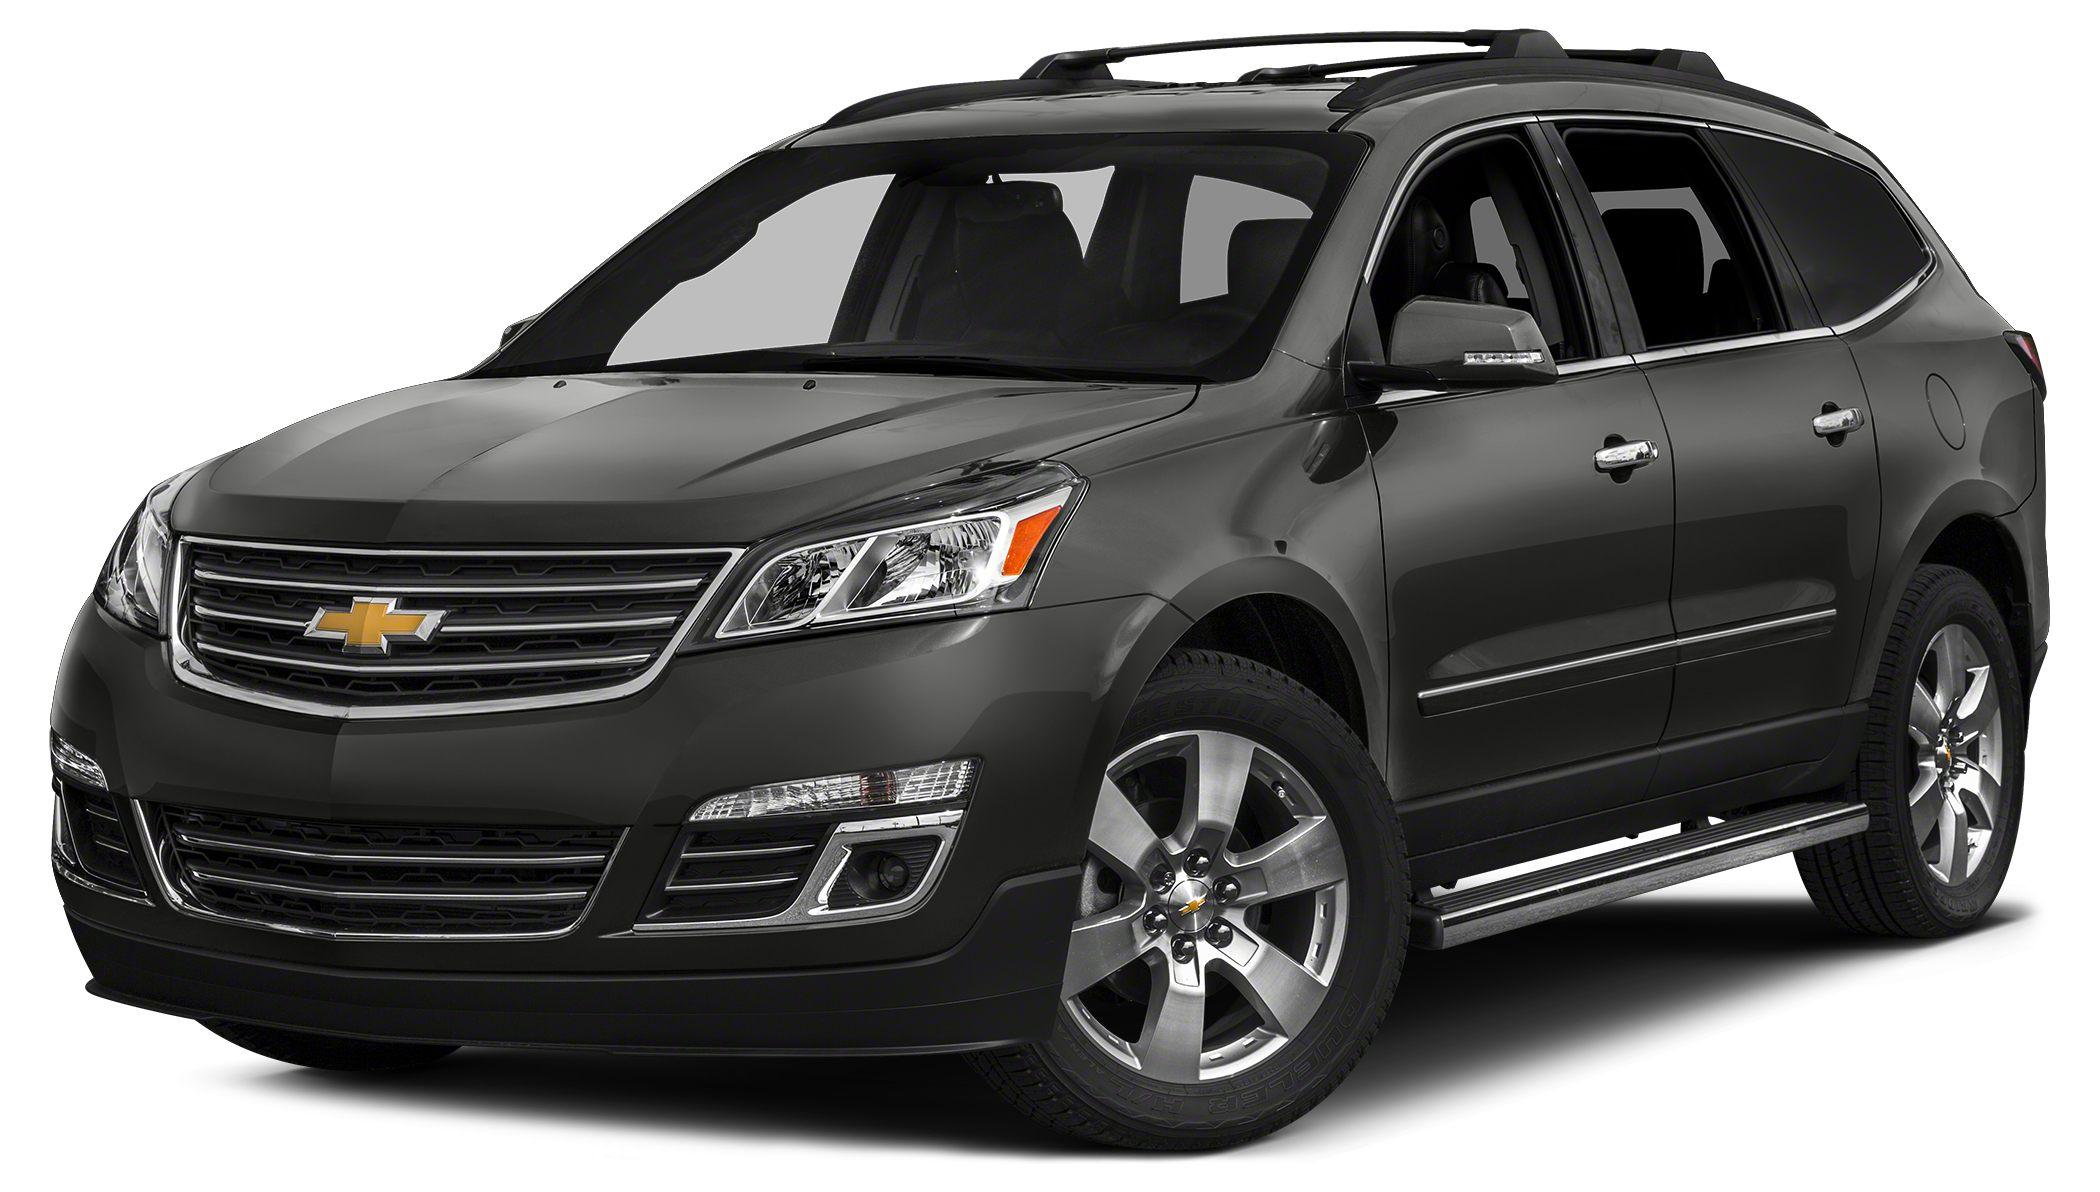 2015 Chevrolet Traverse LTZ Price includes 1500 - General Motors Consumer Cash Program Exp 08